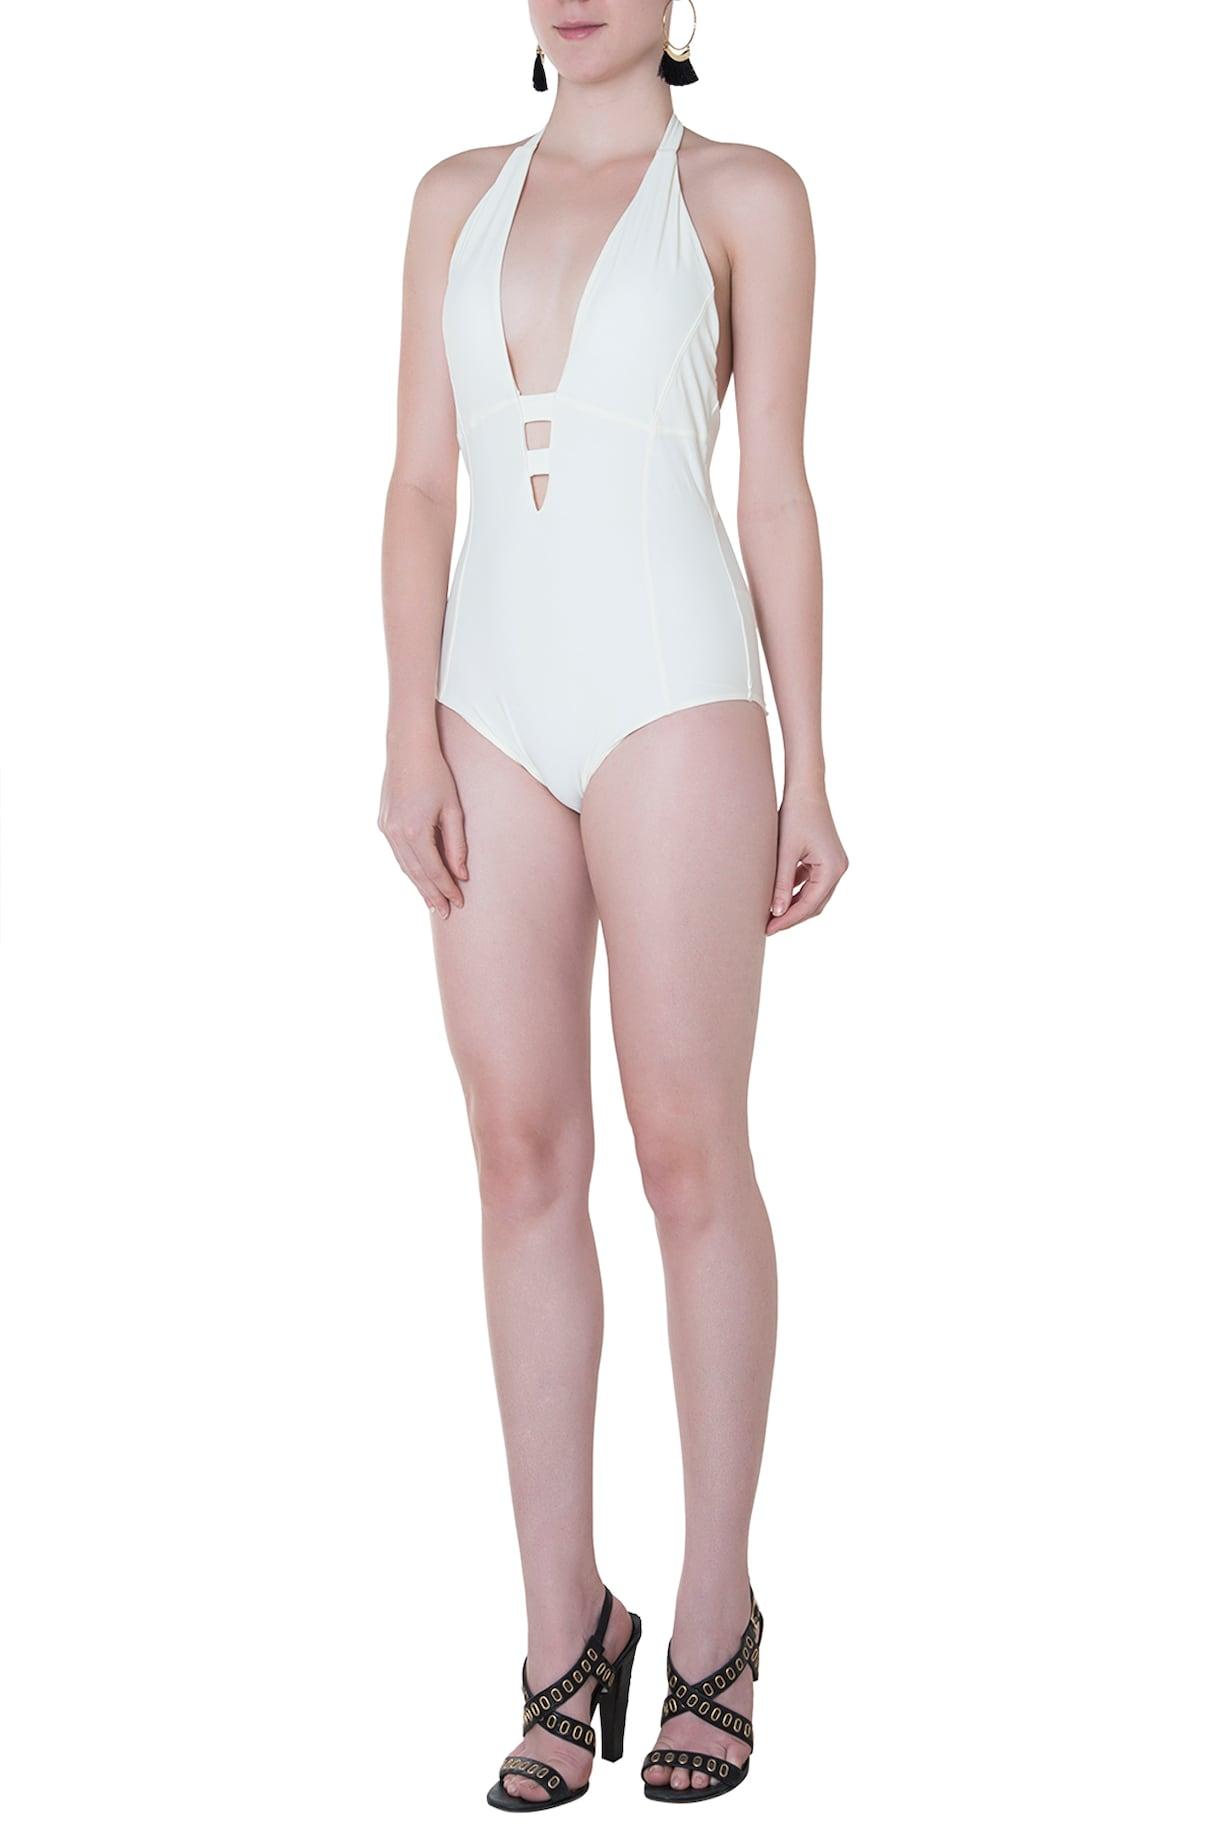 PA.NI Swimwear Swim suits